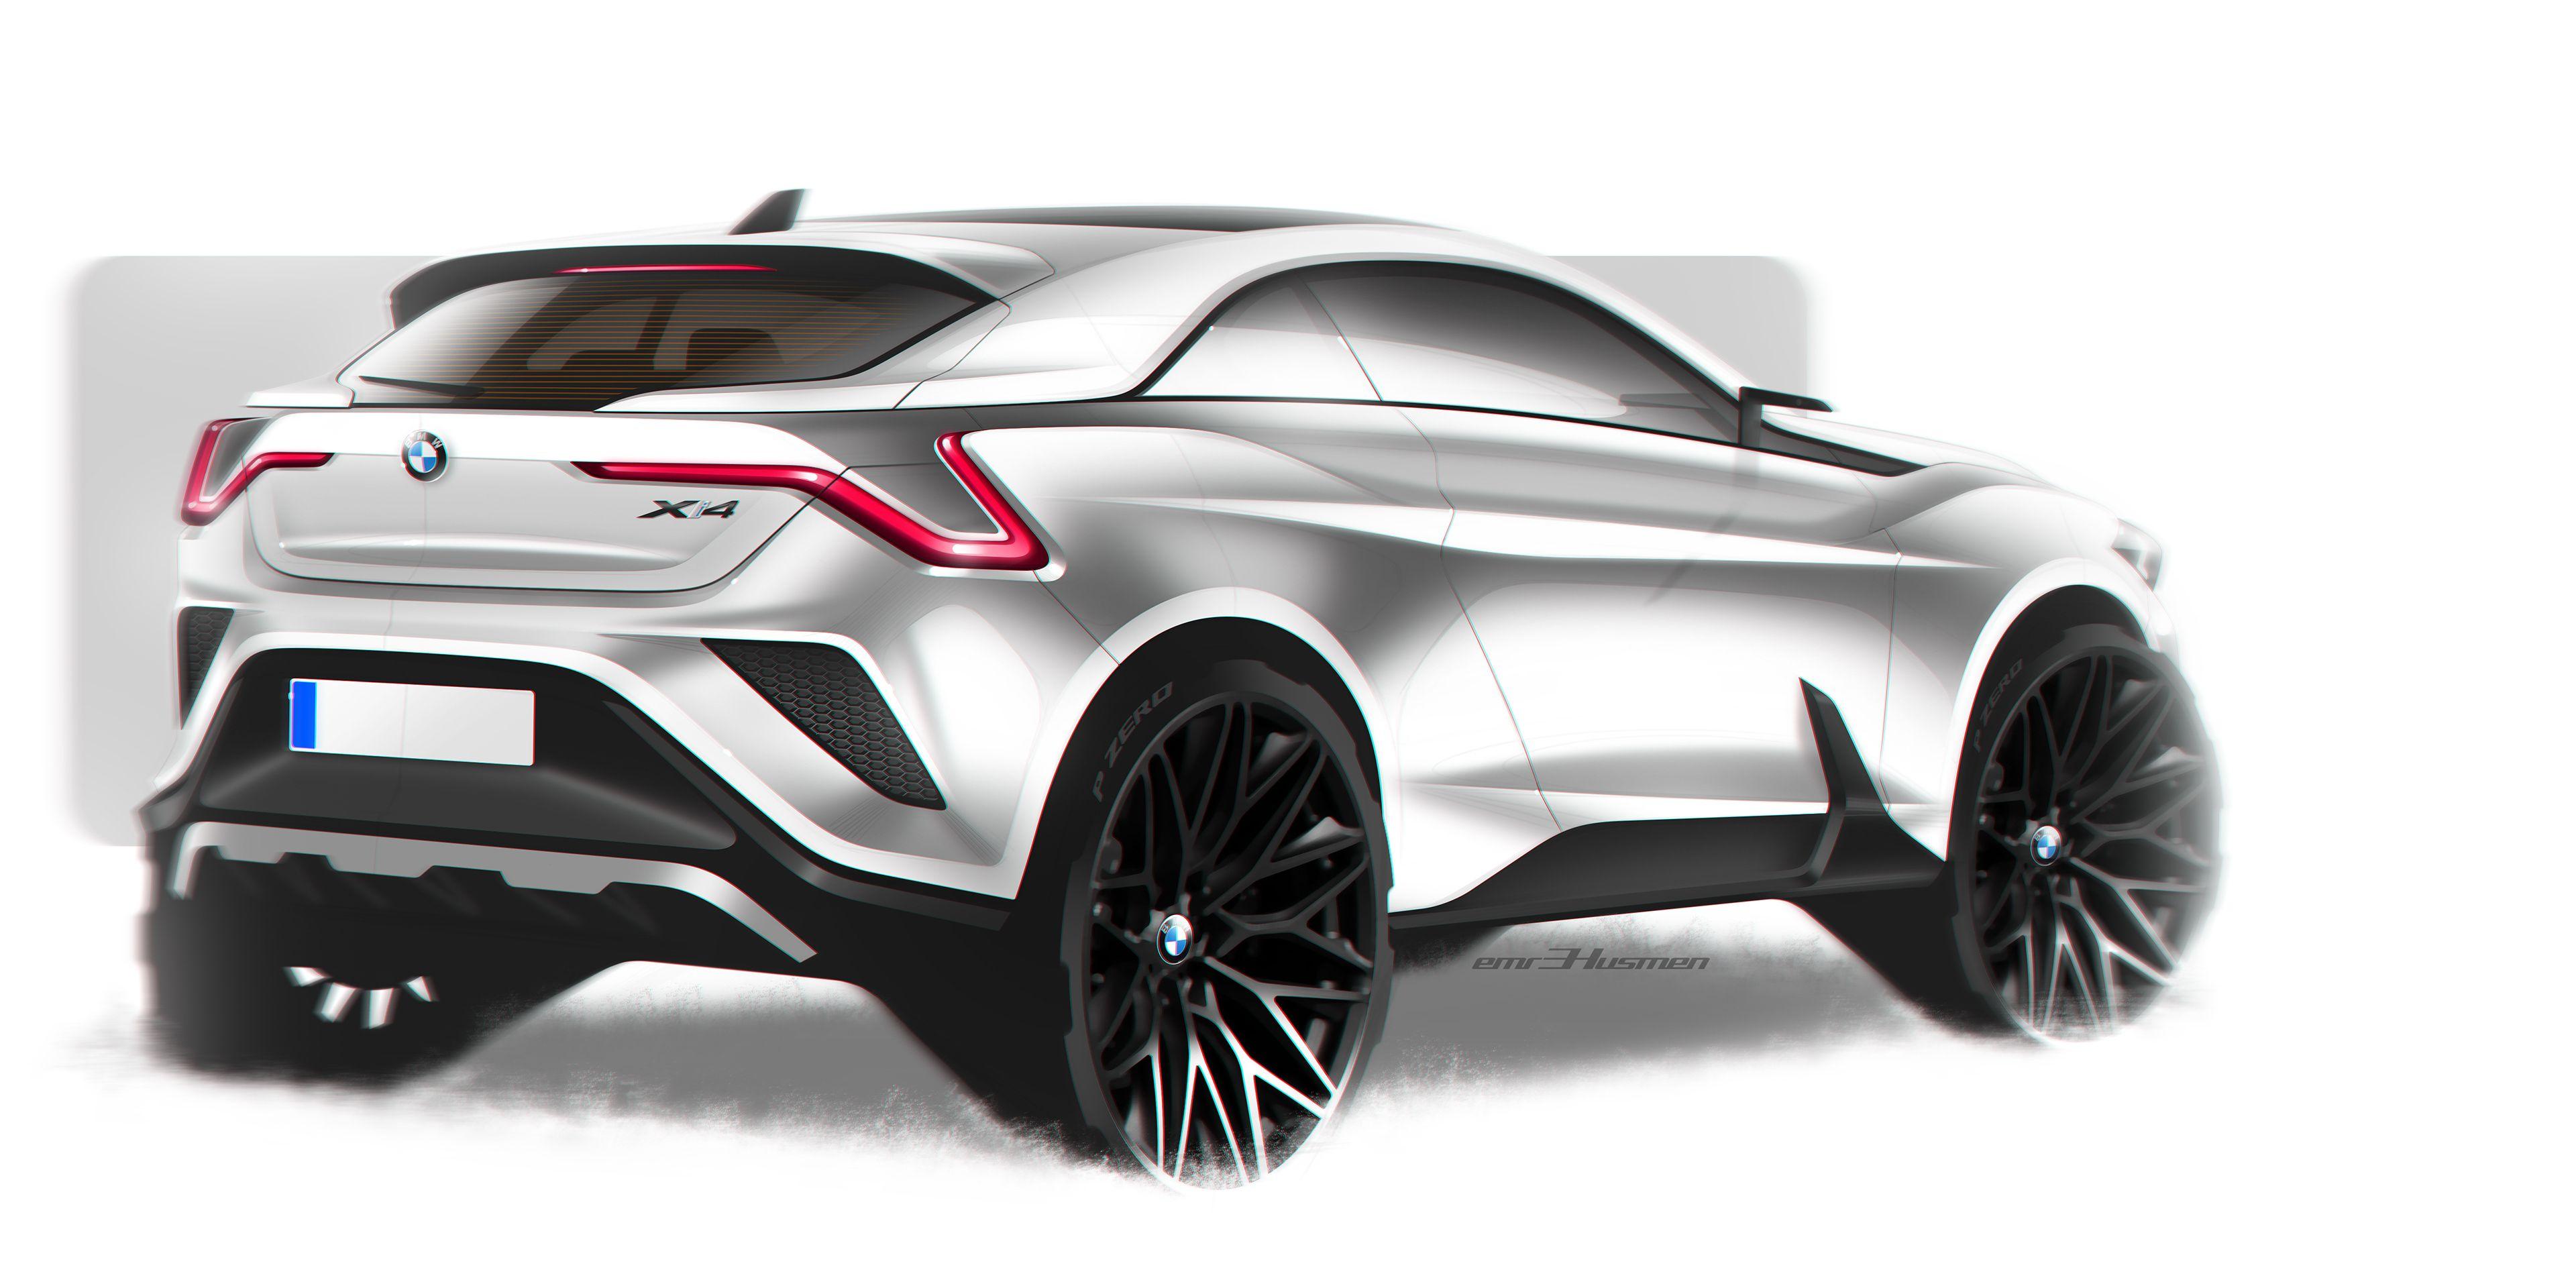 Lexus lf gh concept 2011 exterior detail 49 of 49 1600x1200 - Bmw